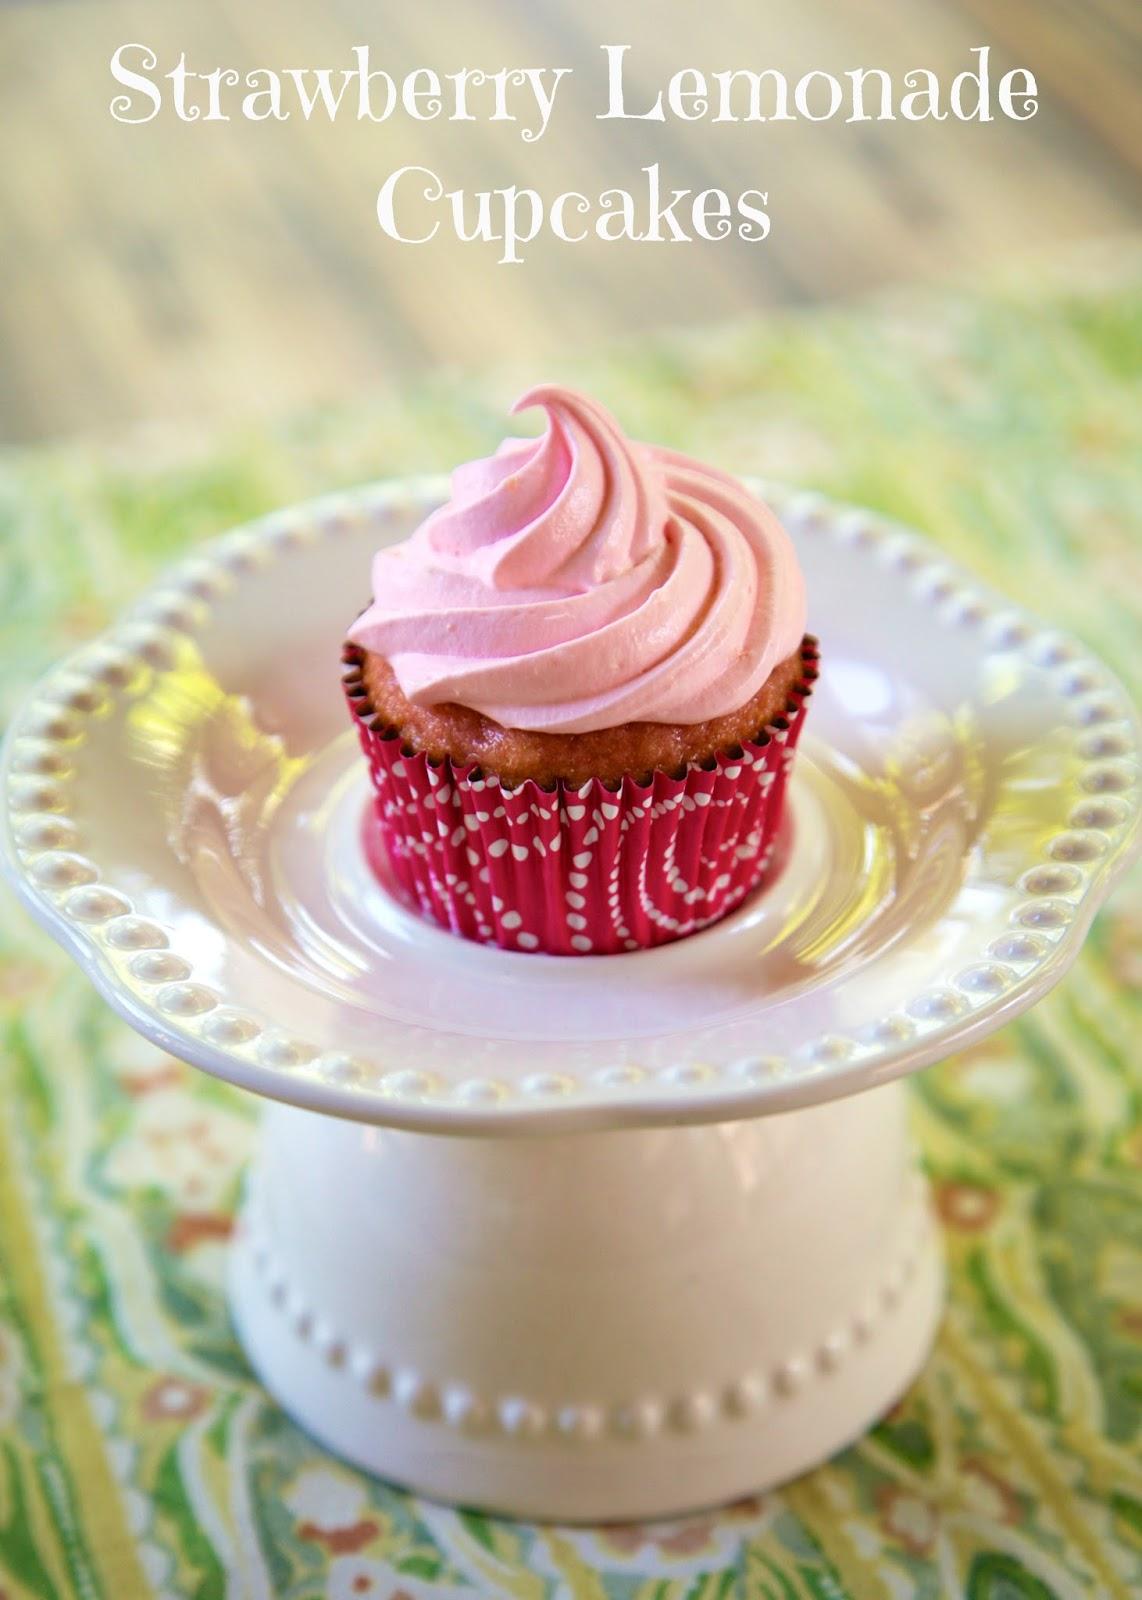 Strawberry Lemonade CupcakesLemonade Cupcakes